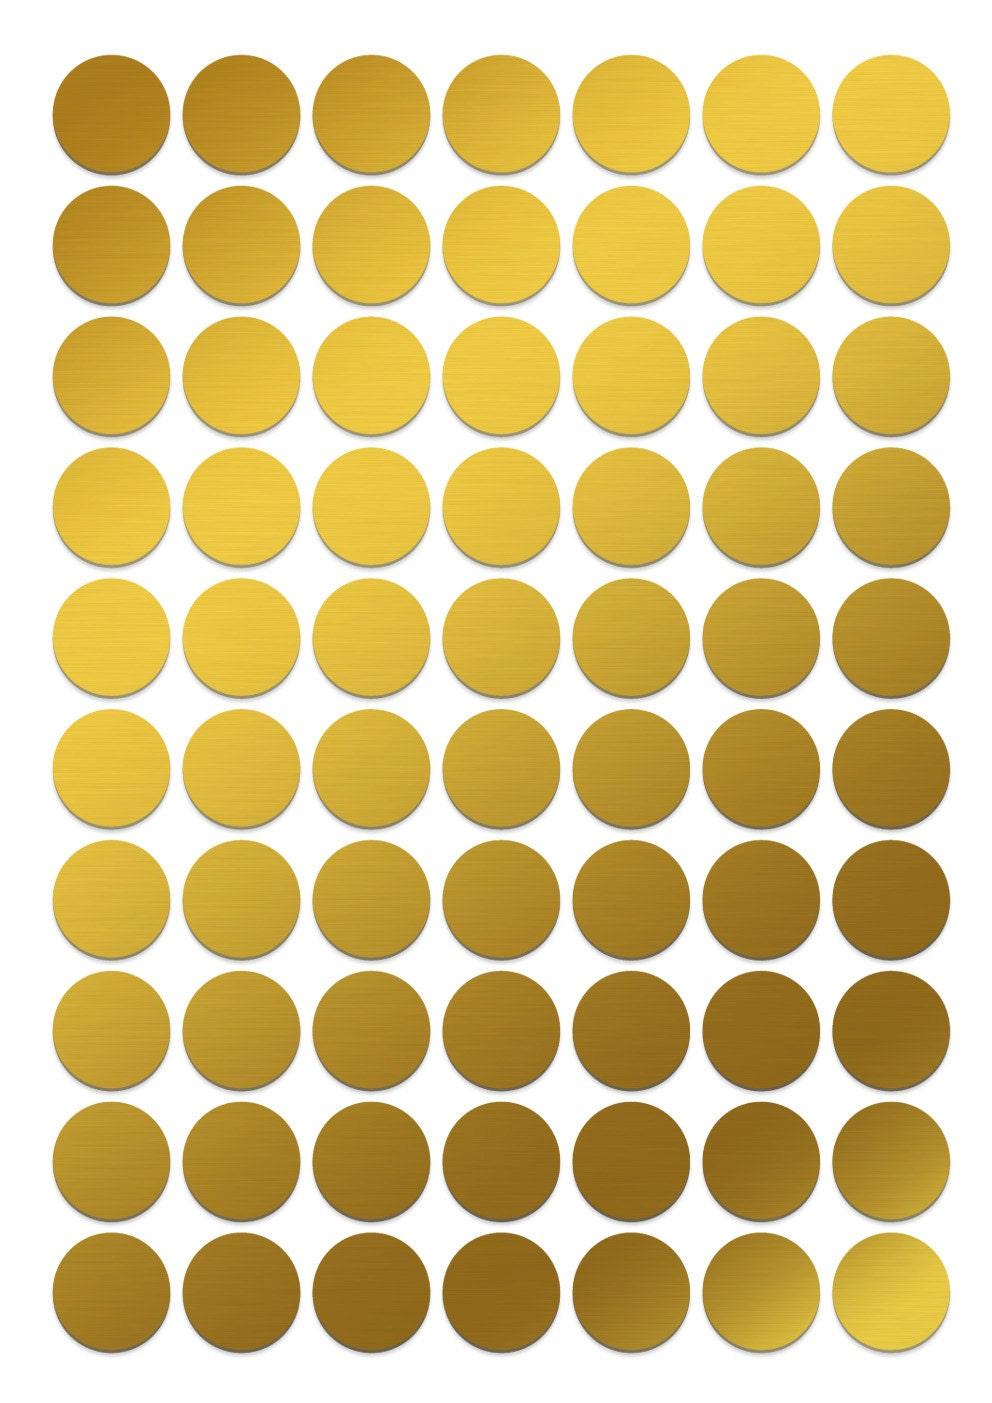 rodan and fields round stickers, rodan and fields circle stickers